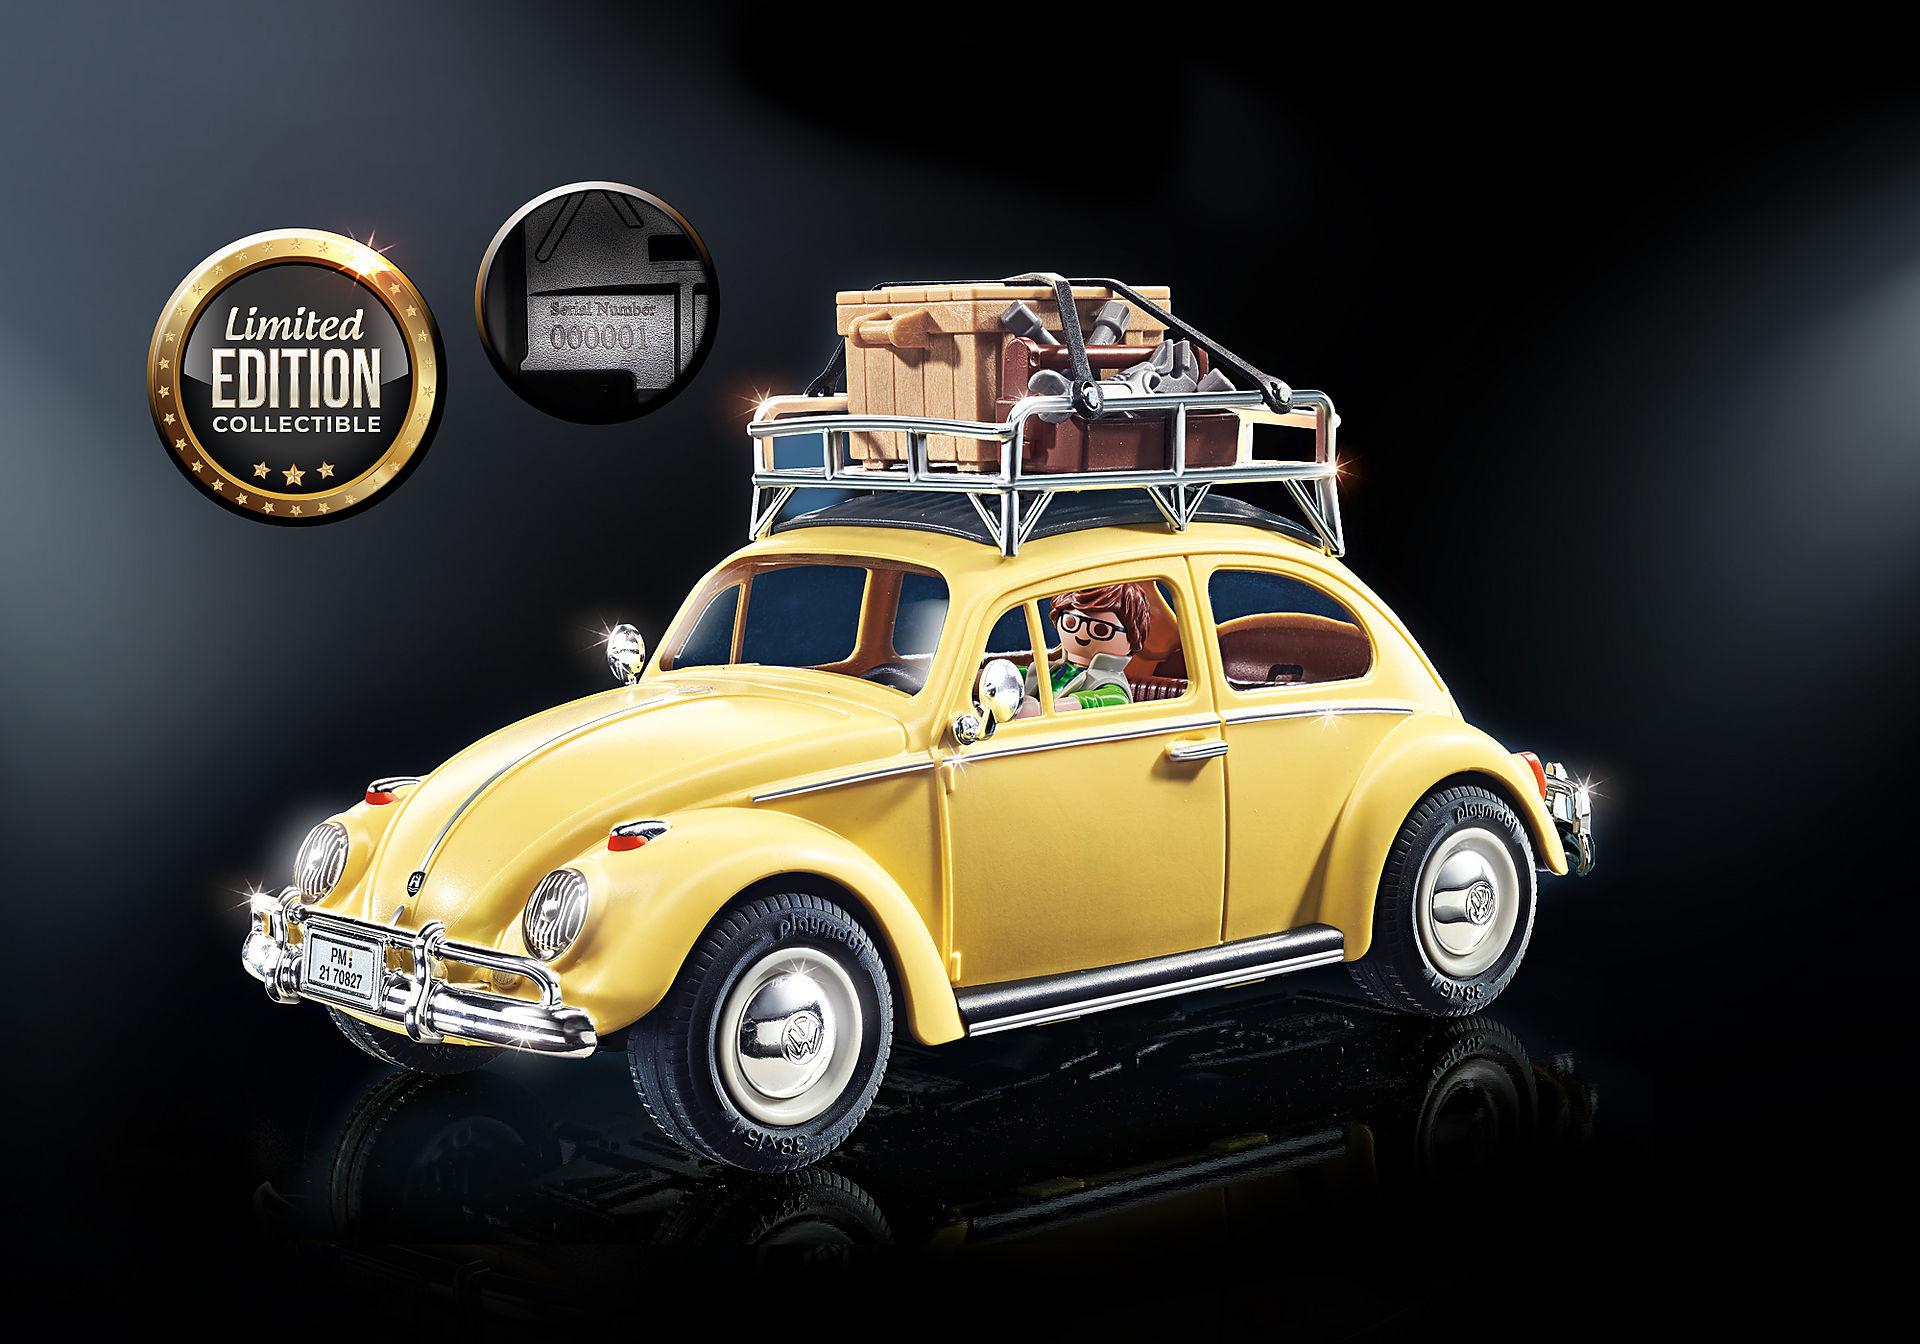 70827 Volkswagen Σκαραβαίος - Special Edition zoom image1